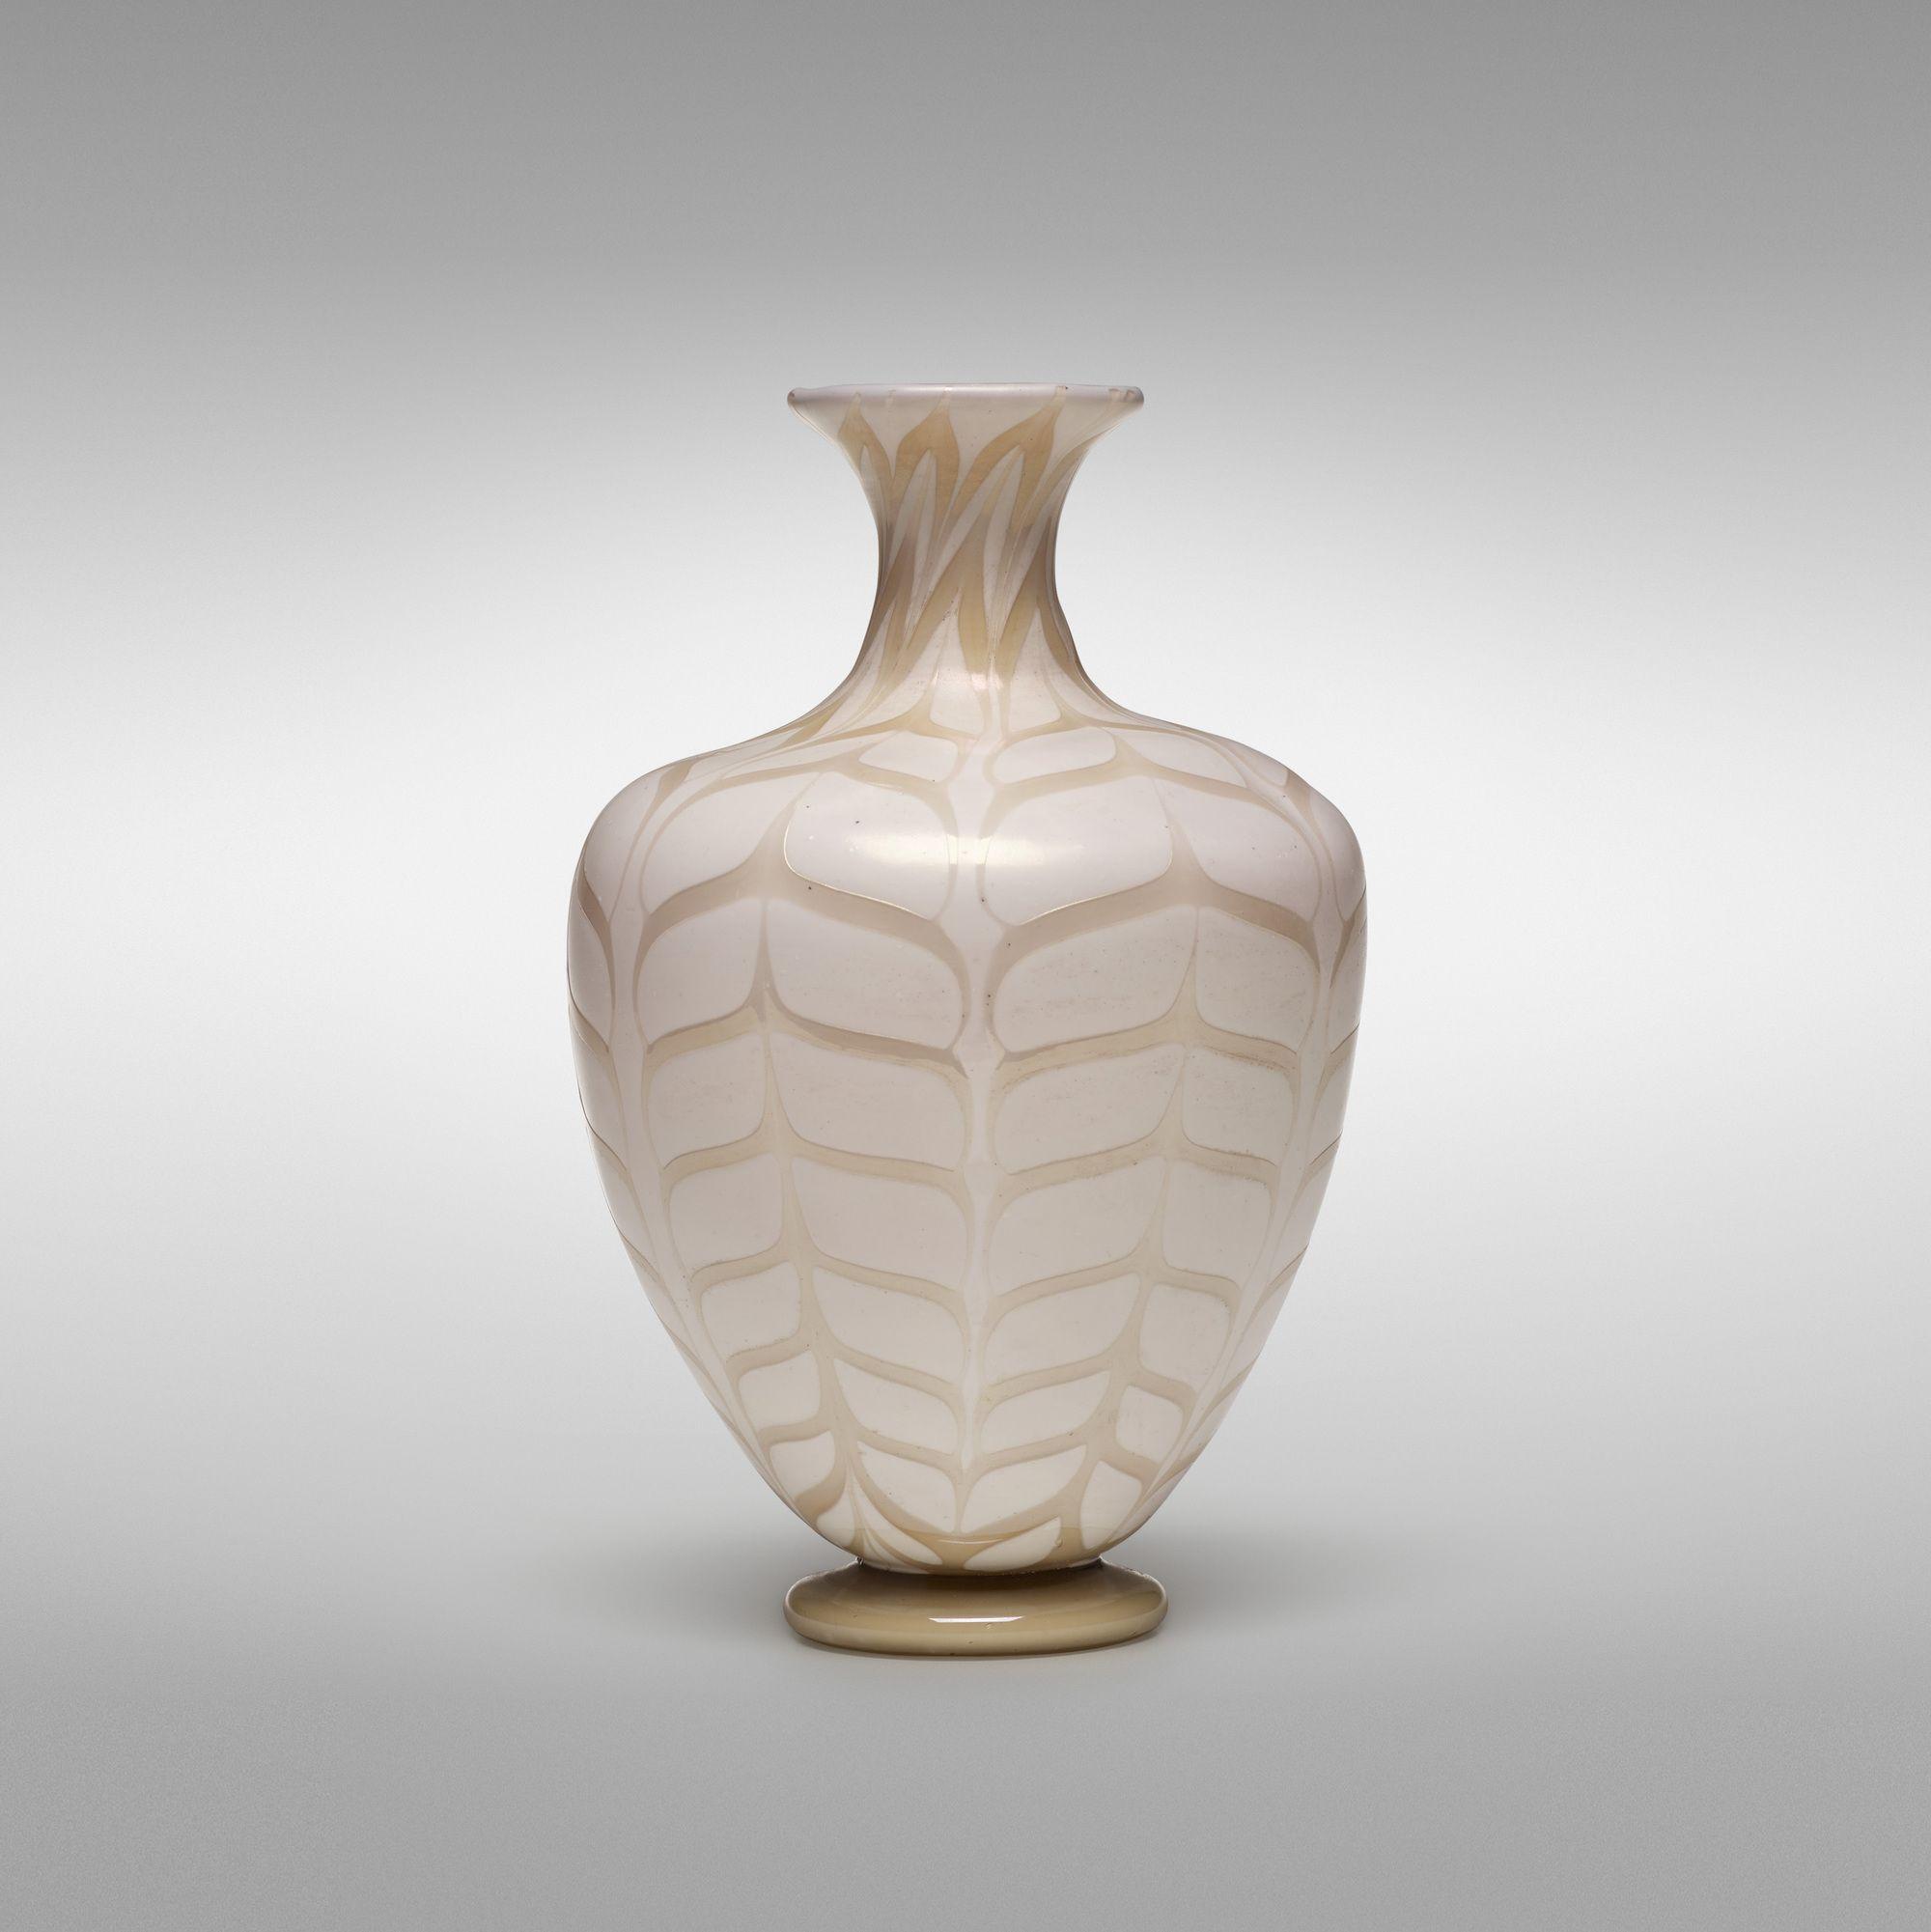 Carlo scarpa fenicio vase wright20 important italian carlo scarpa fenicio vase wright20 floridaeventfo Image collections